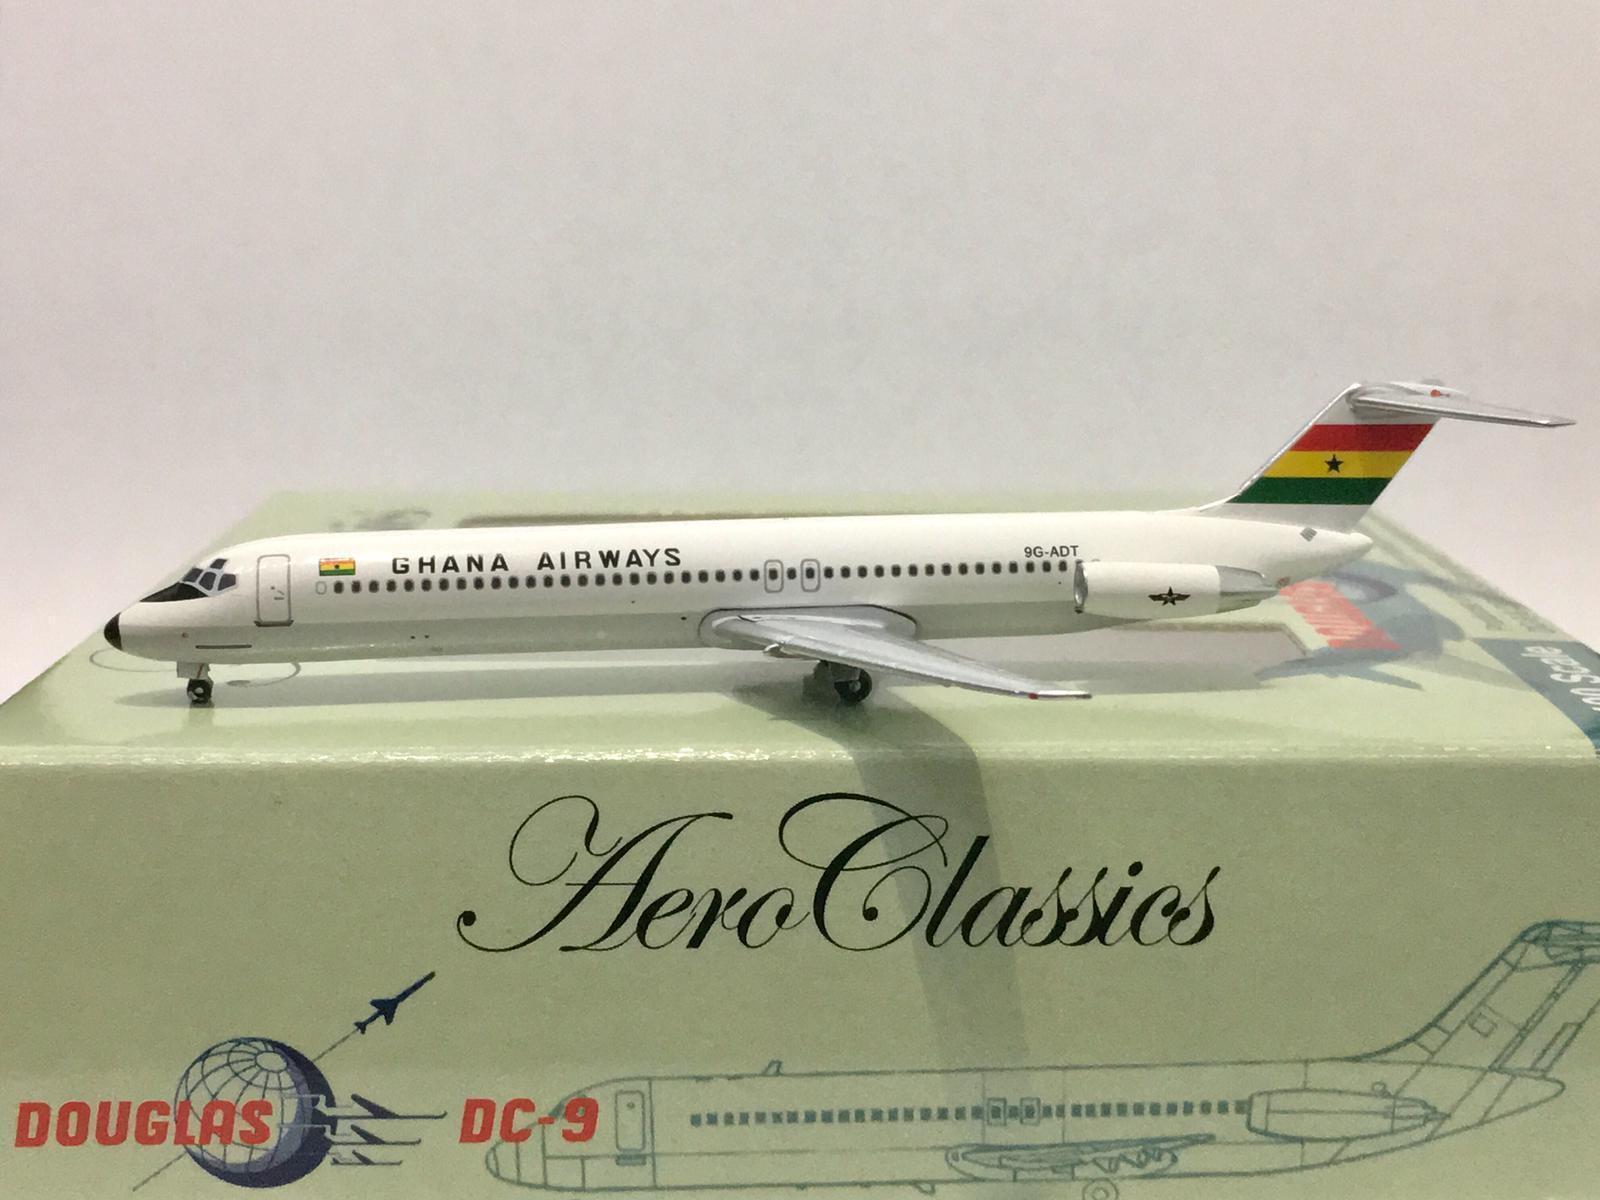 Aeroclassics Ghana Airways Airways Airways DC-9-50 1 400 9G-ADT AC71219 24207c